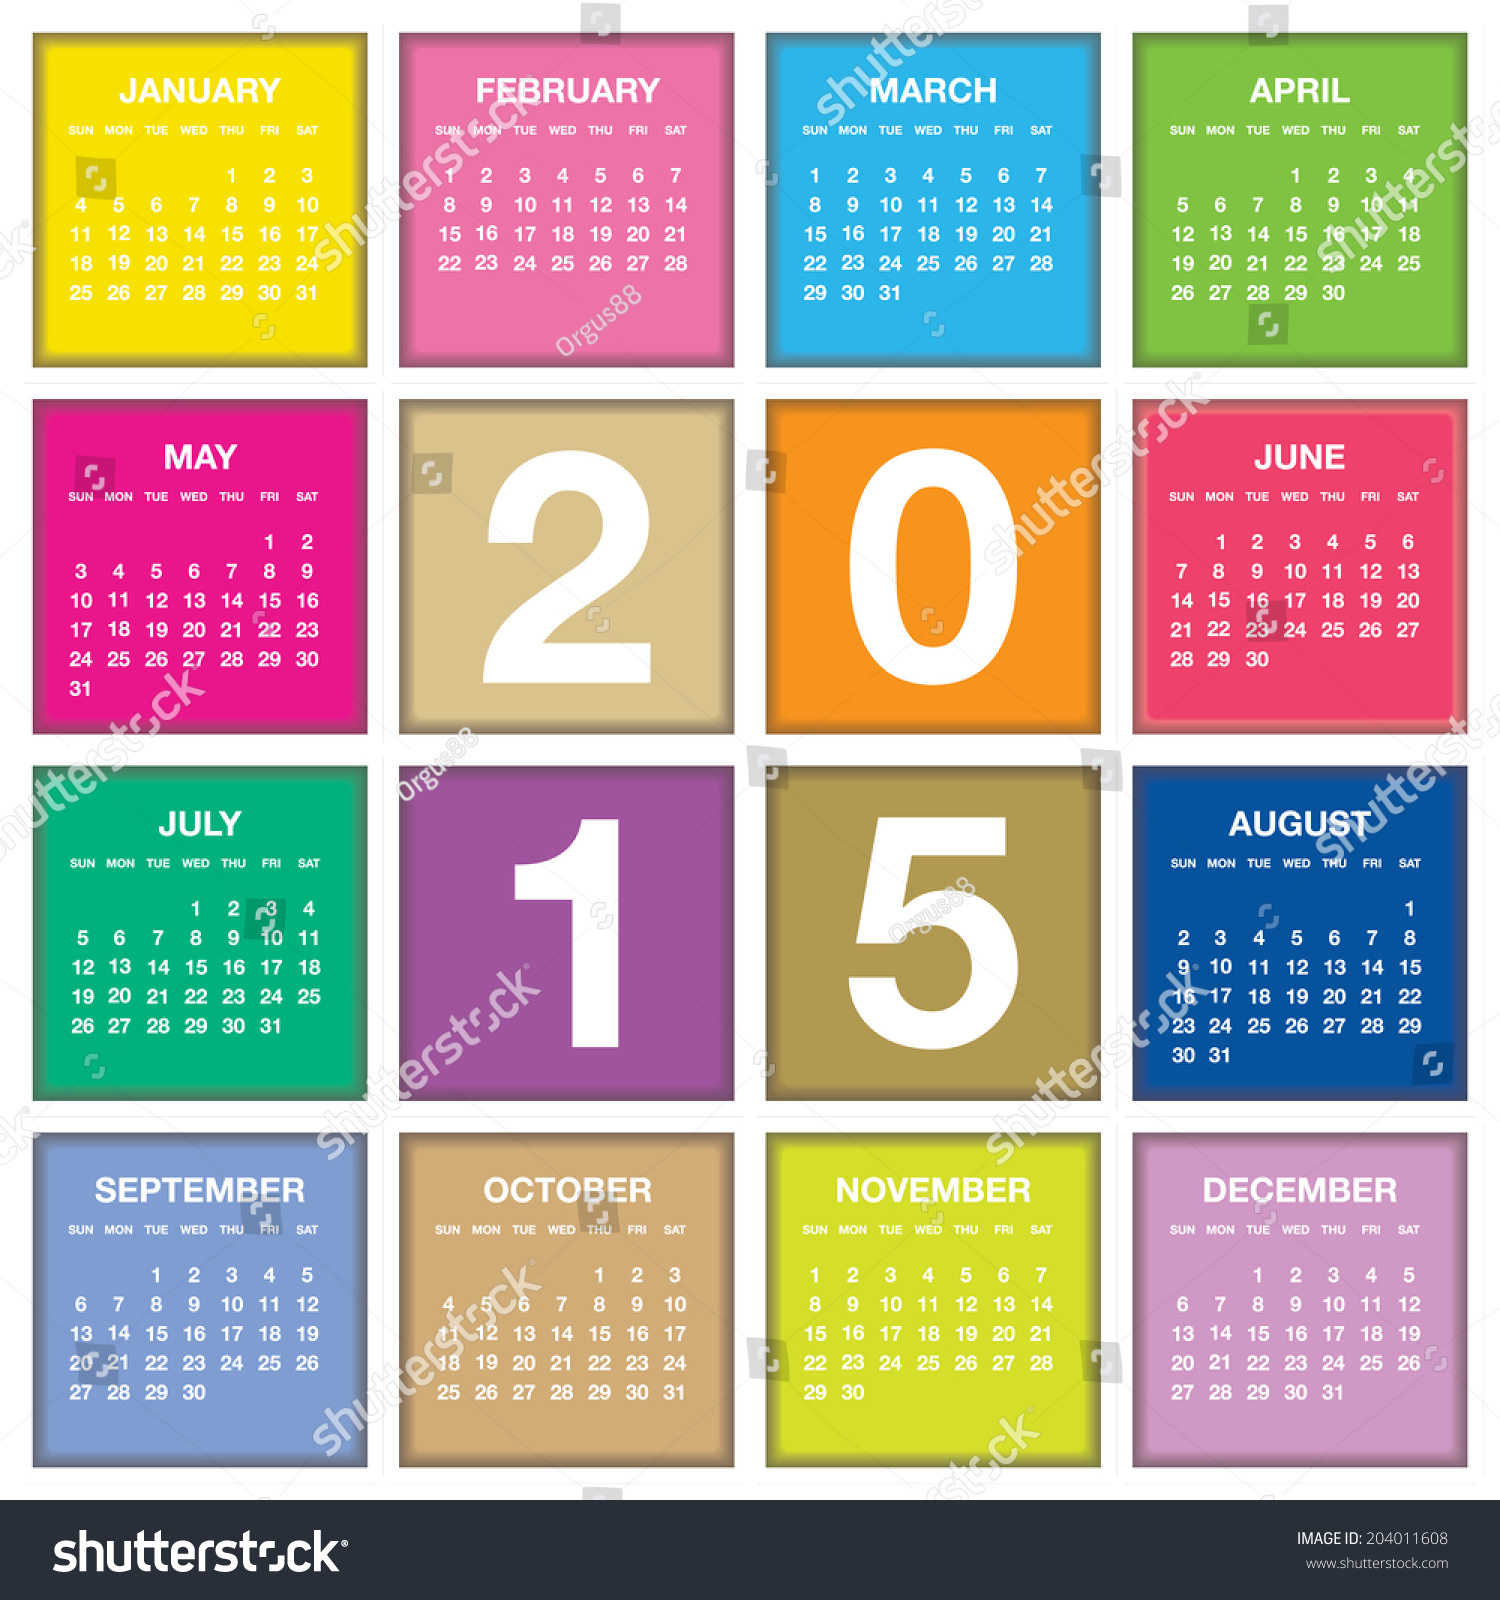 Year Calendar Vector : Royalty free year vector calendar …